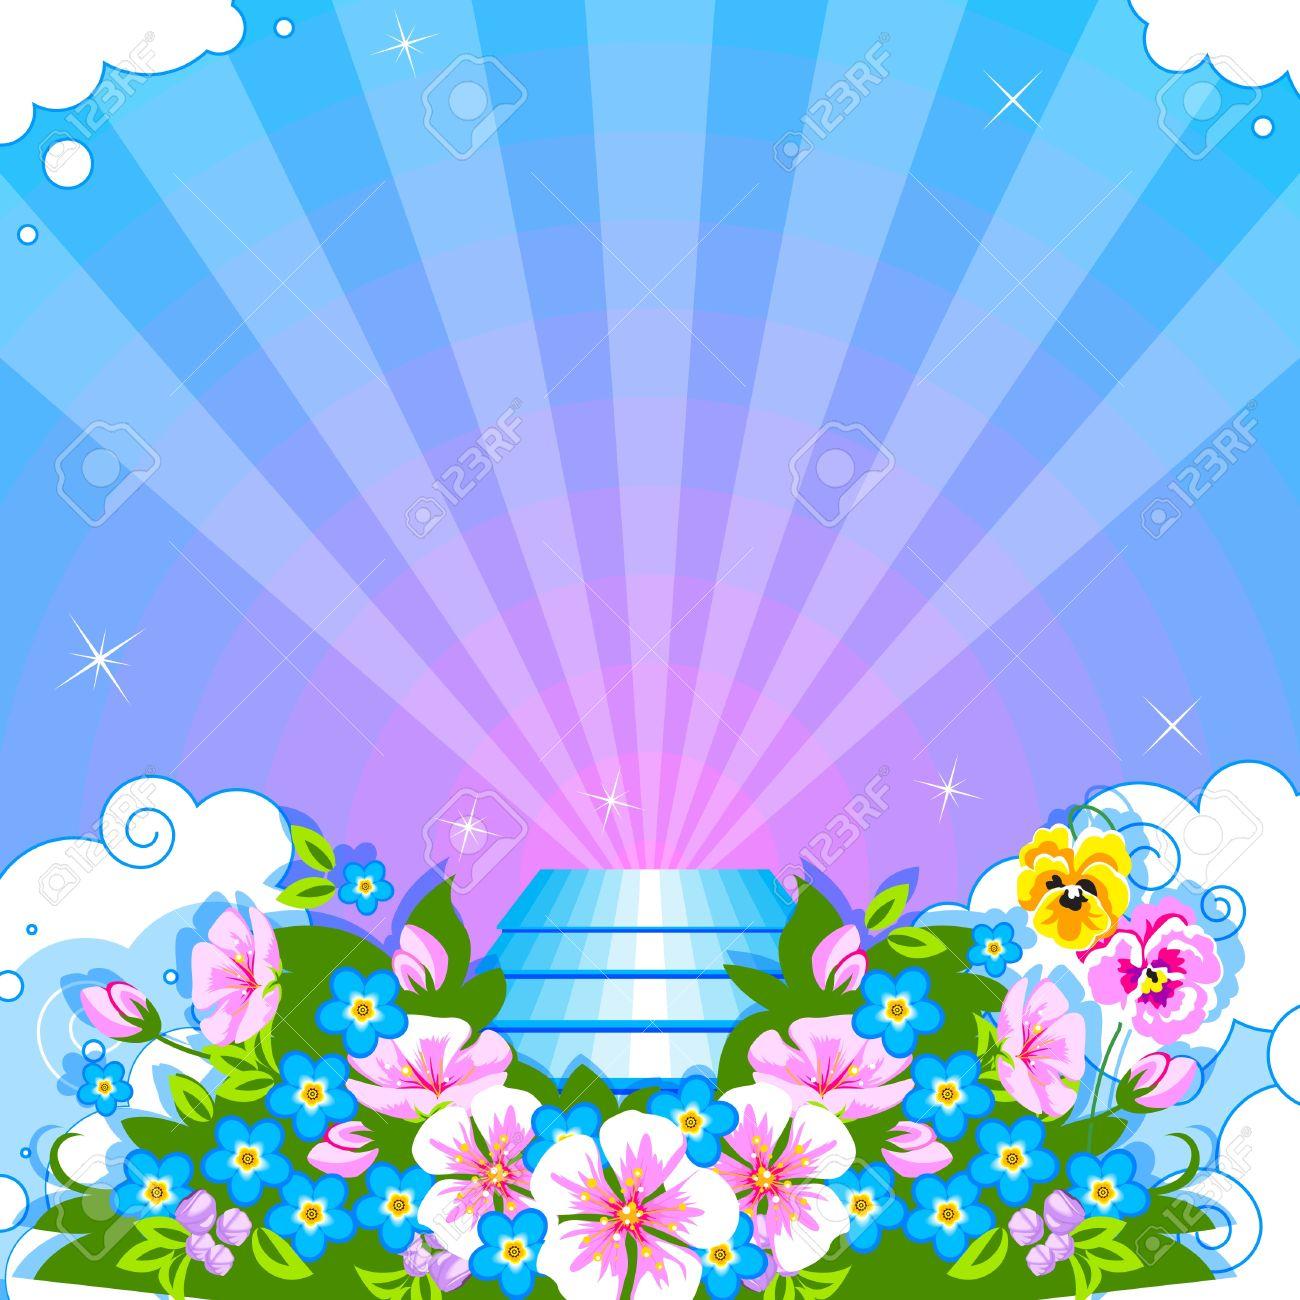 1300x1300 Heaven Clipart Spiritual